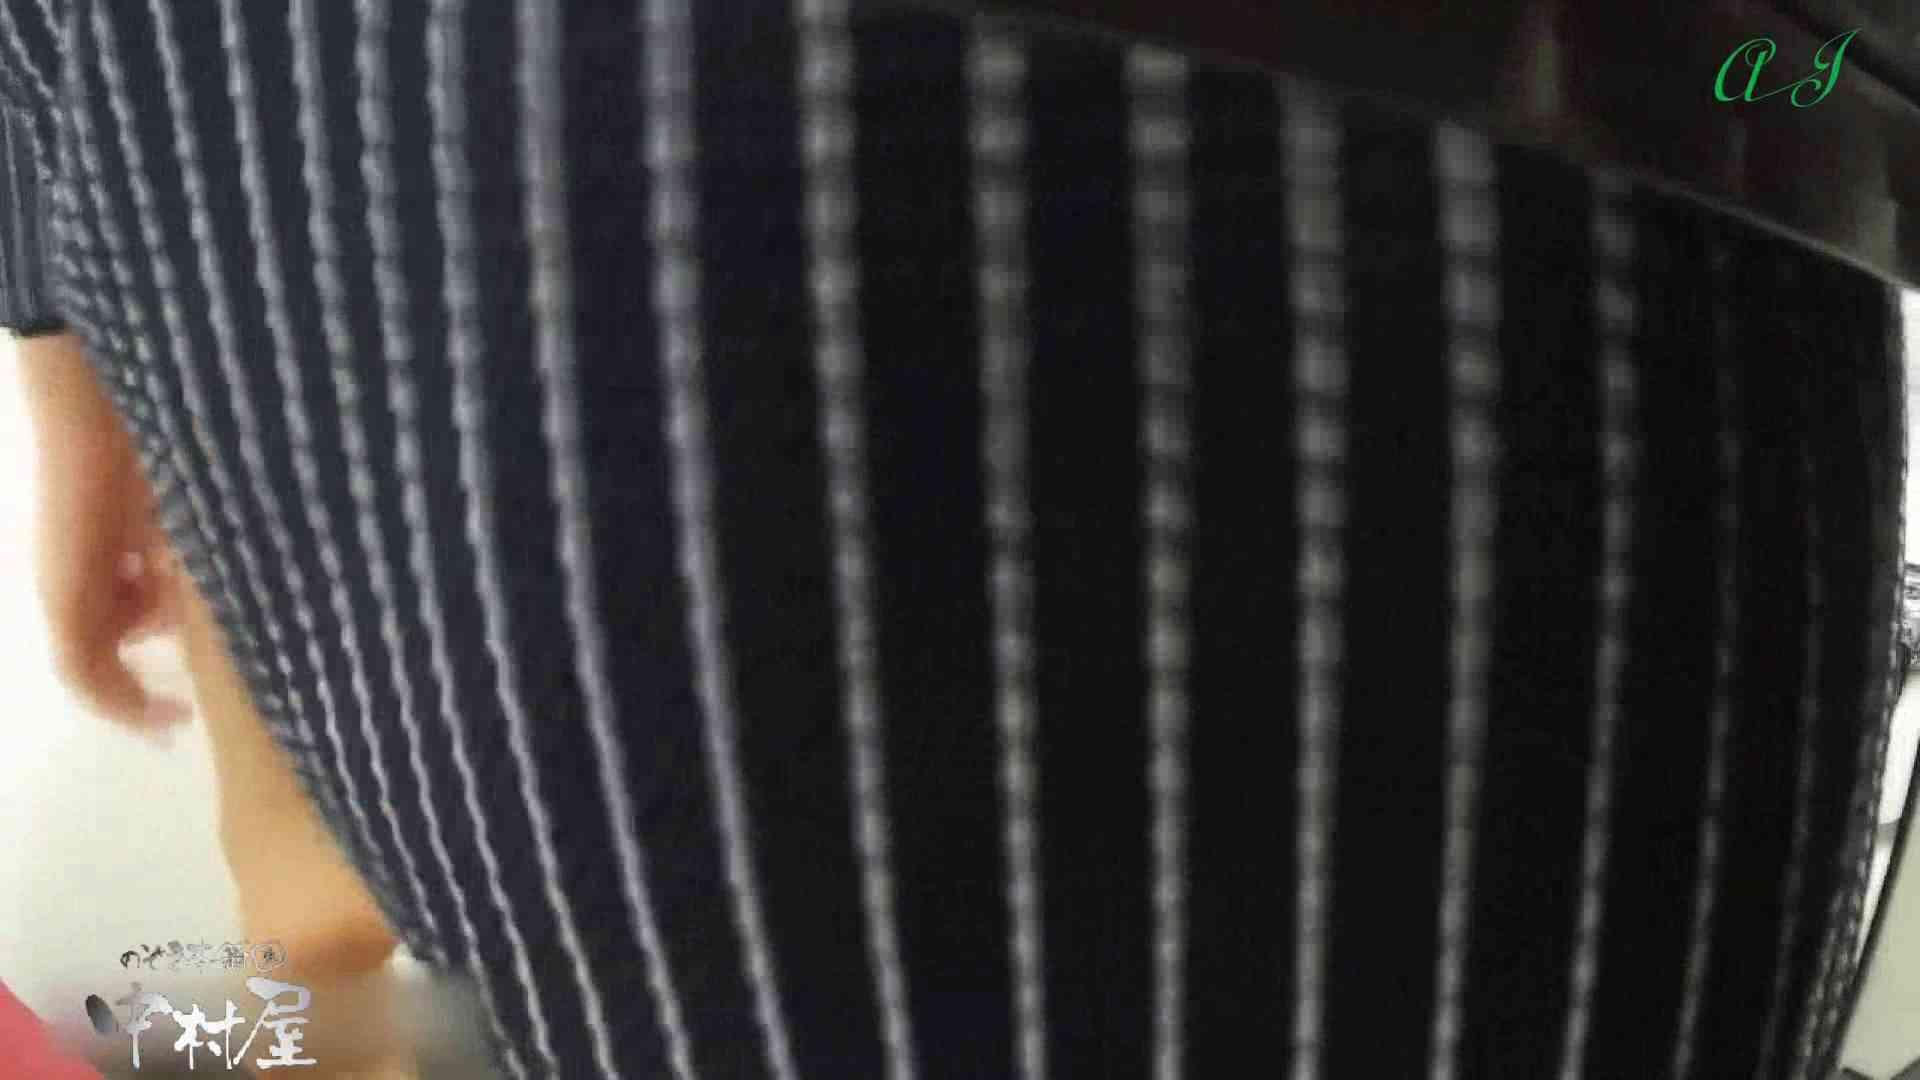 有名大学女性洗面所 vol.84後編 潜入 おまんこ無修正動画無料 93連発 42